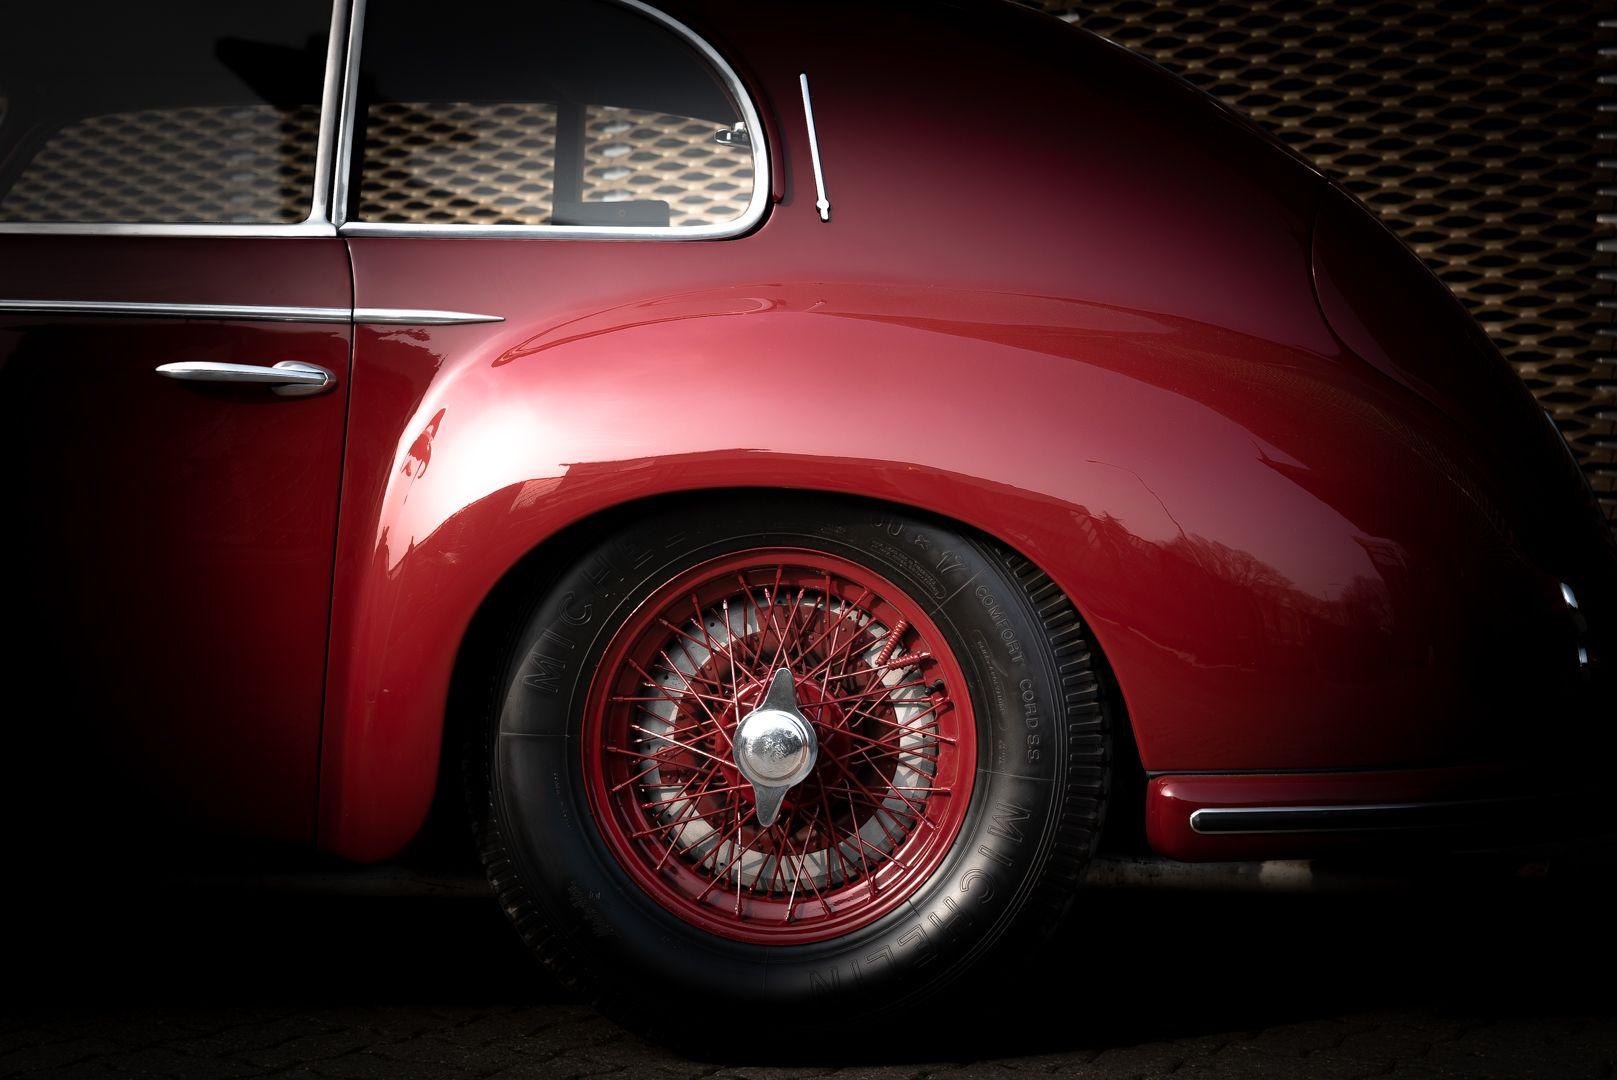 1947 Alfa Romeo Freccia d'oro 6C 2500 Sport 61686